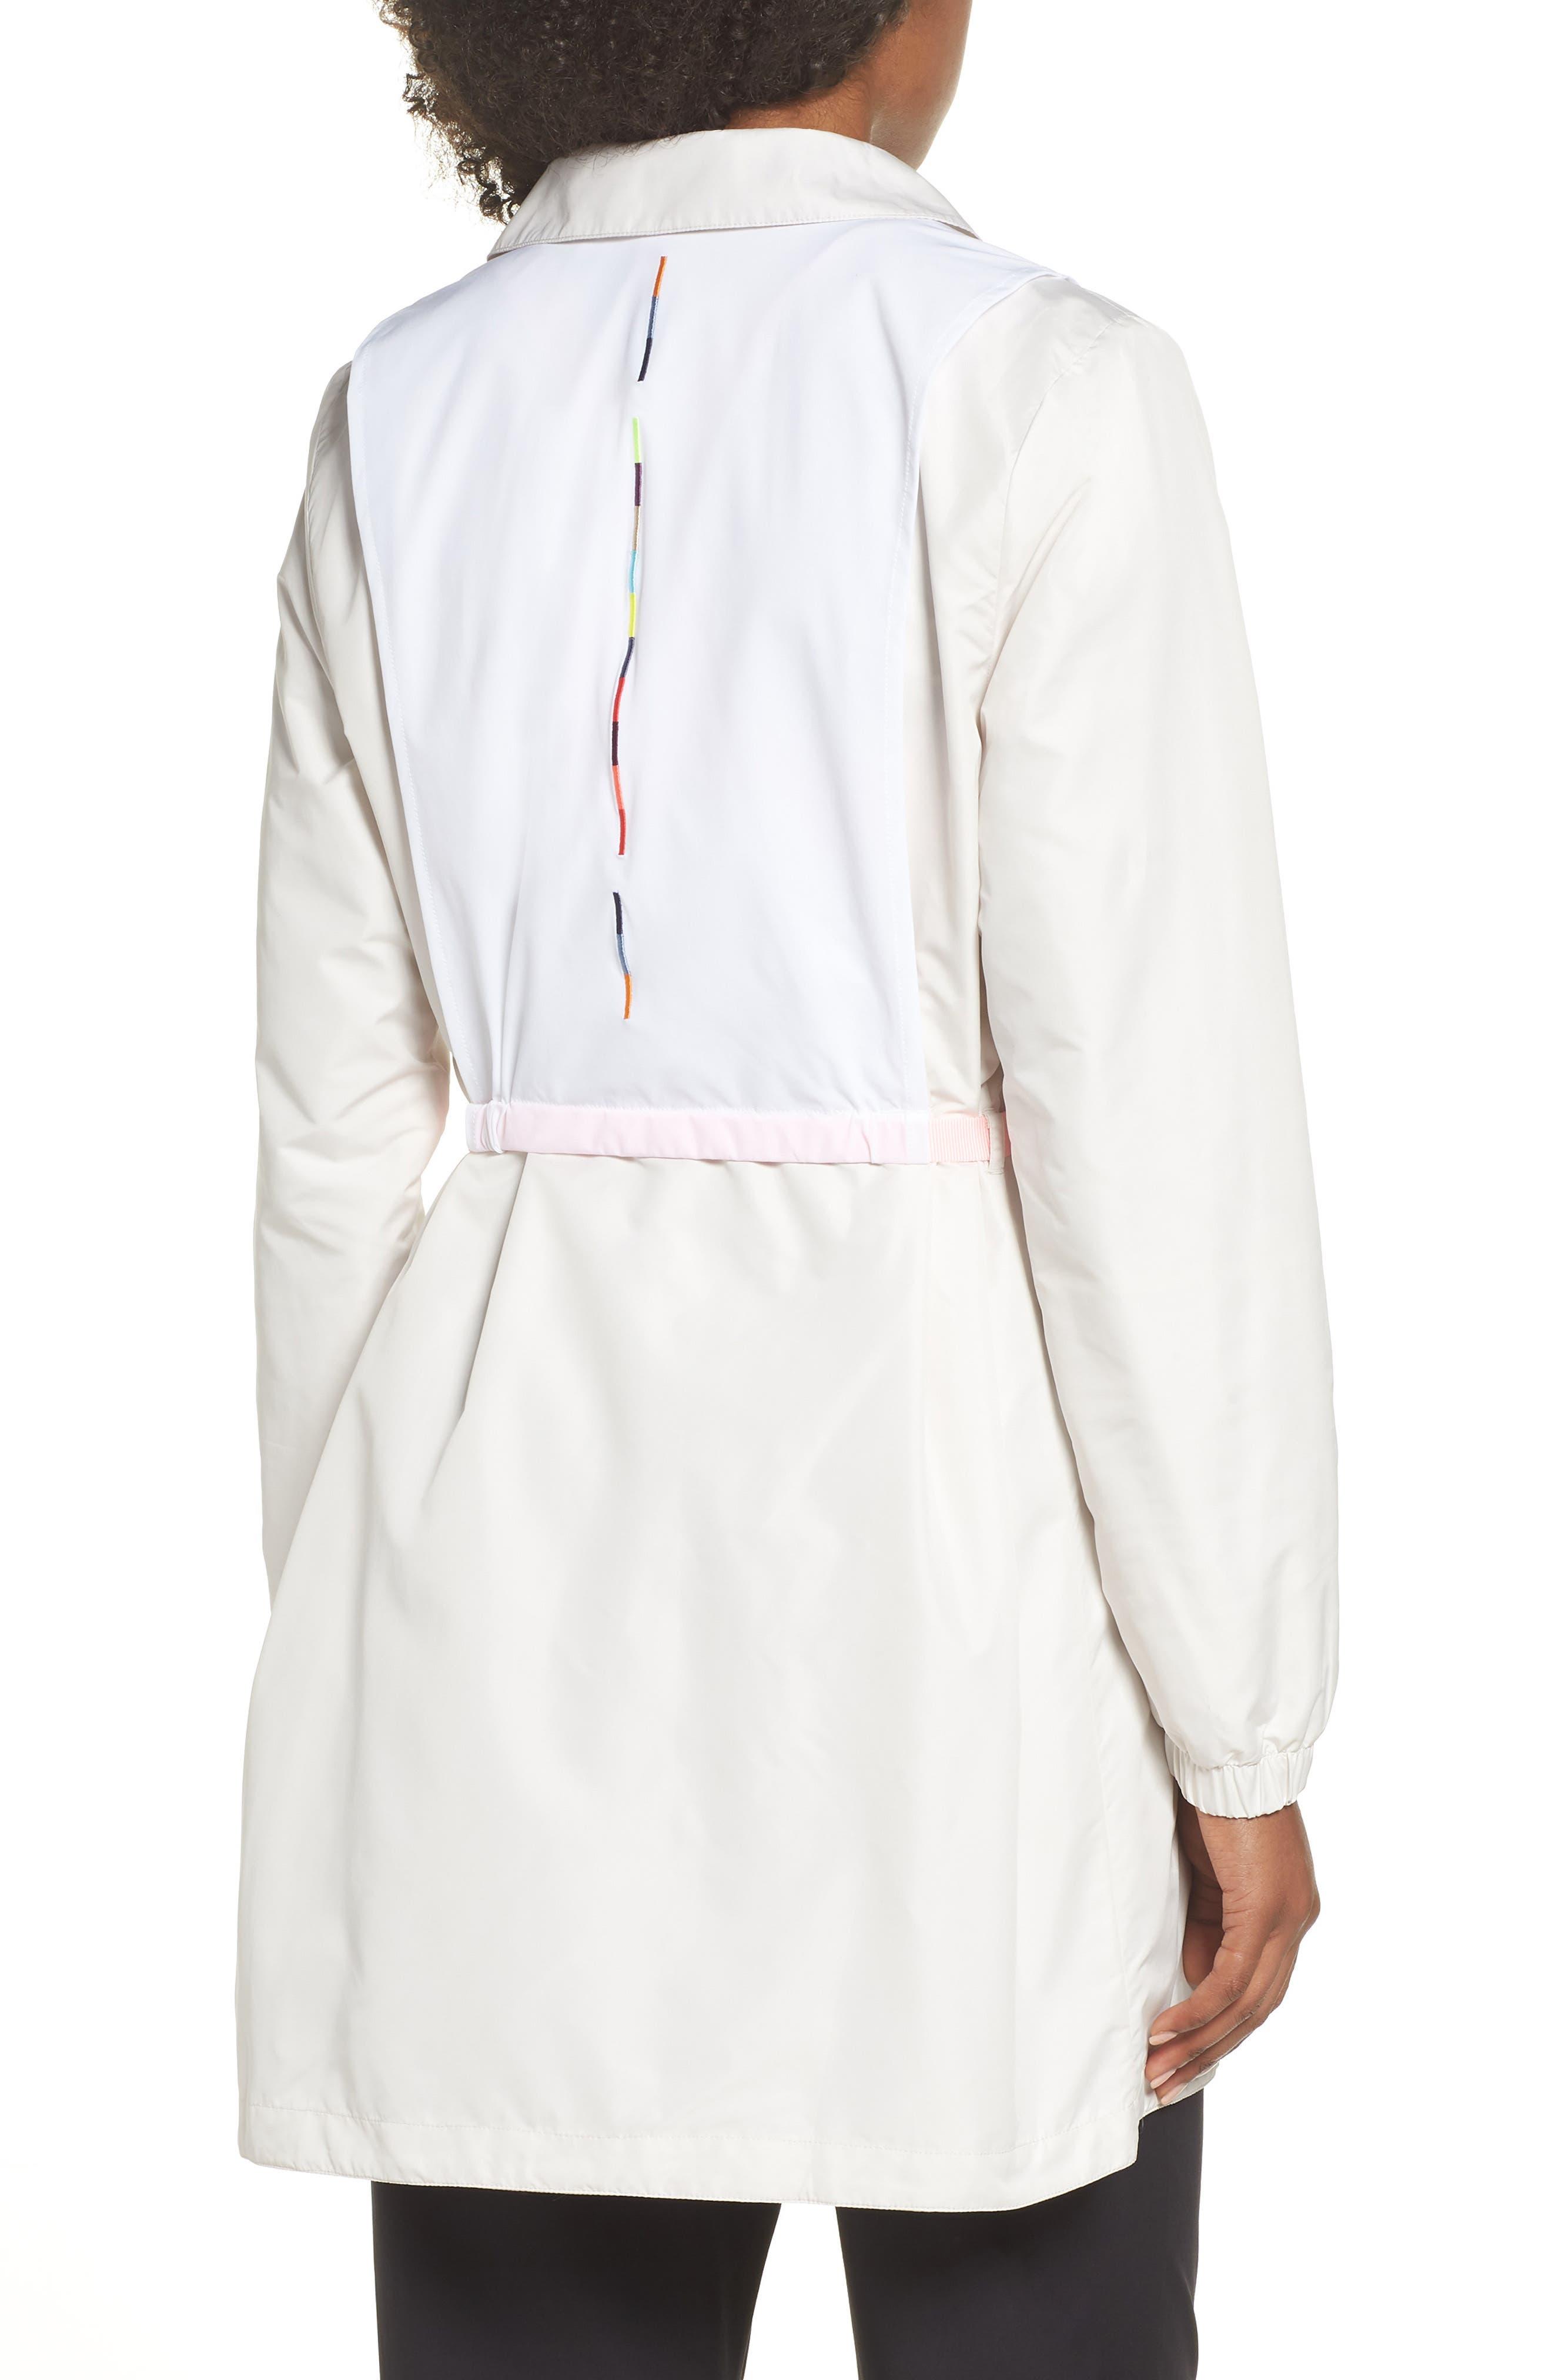 Hybrid Coaches Jacket/Dress,                             Alternate thumbnail 2, color,                             PHANTOM/ WHITE/ ARCTIC PUNCH